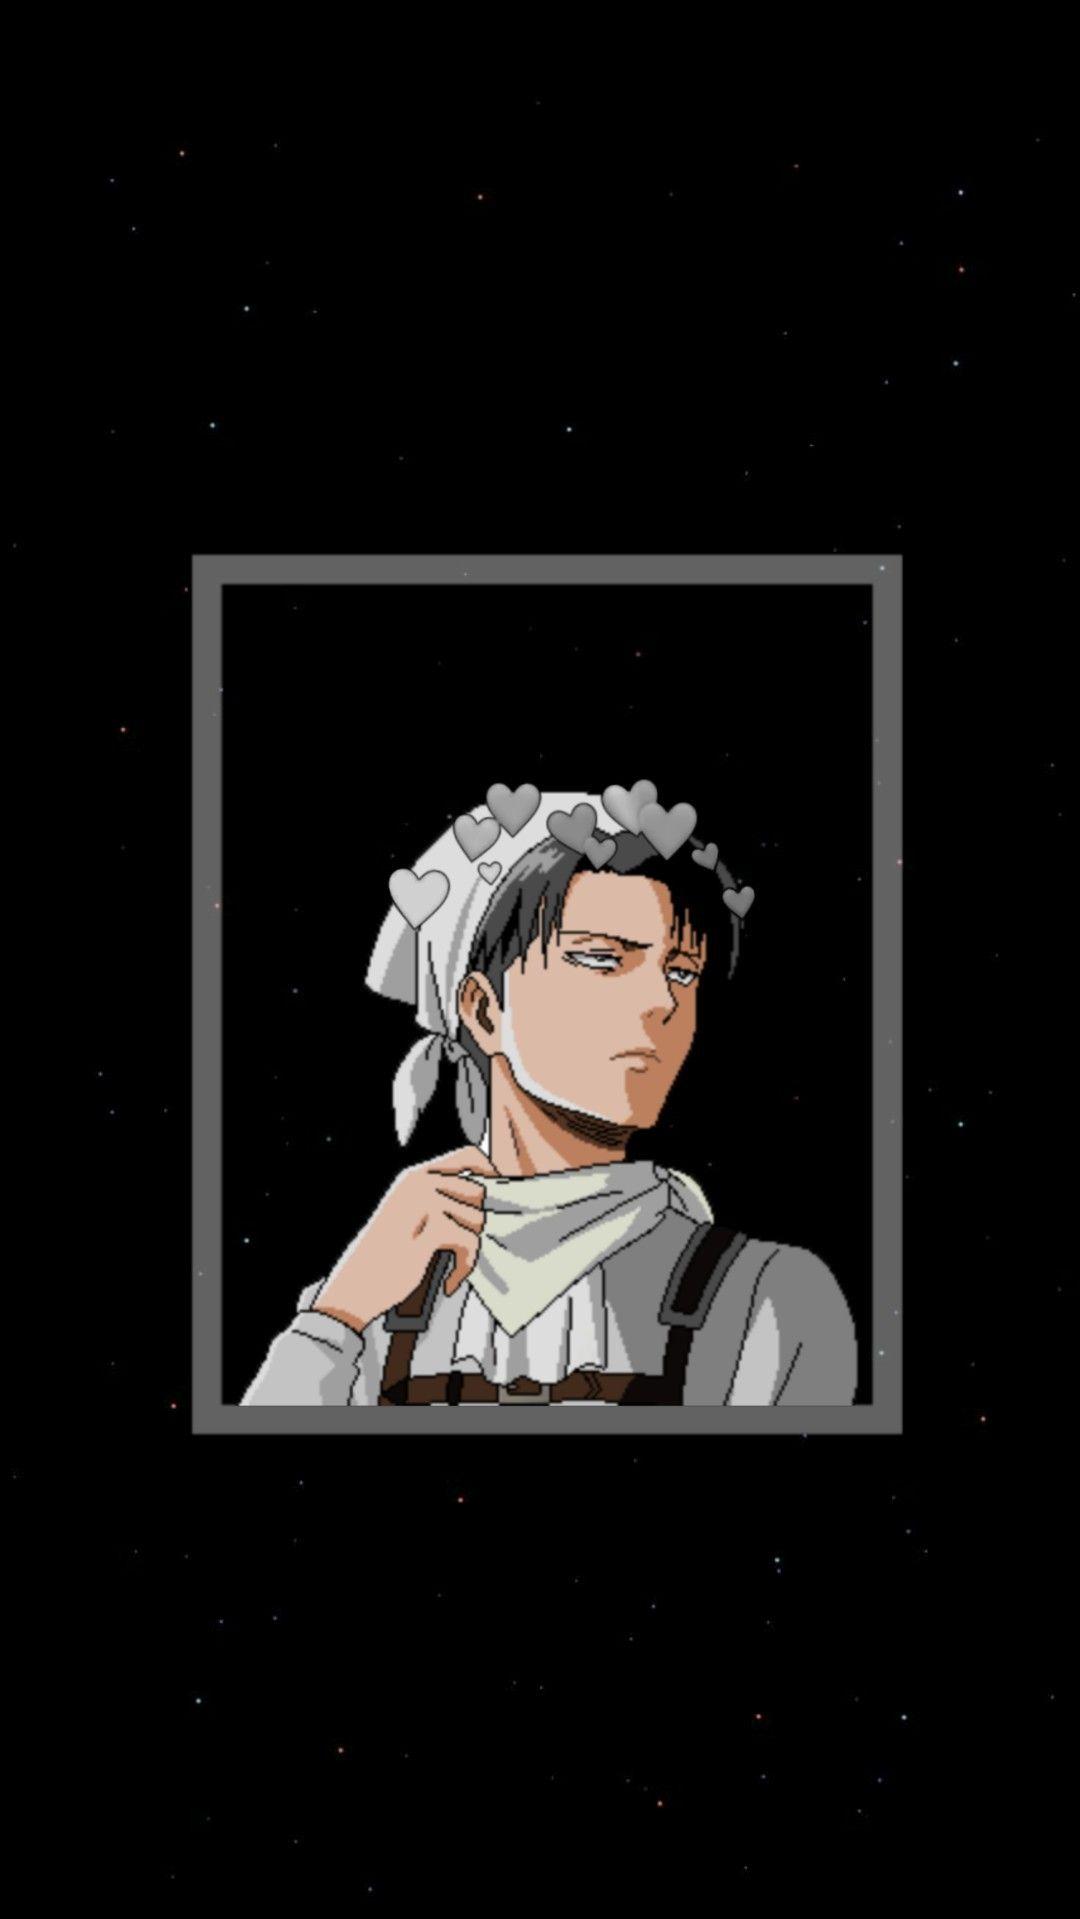 Aesthetic Levi In 2020 Anime Boyfriend Attack On Titan Levi Levi Ackerman